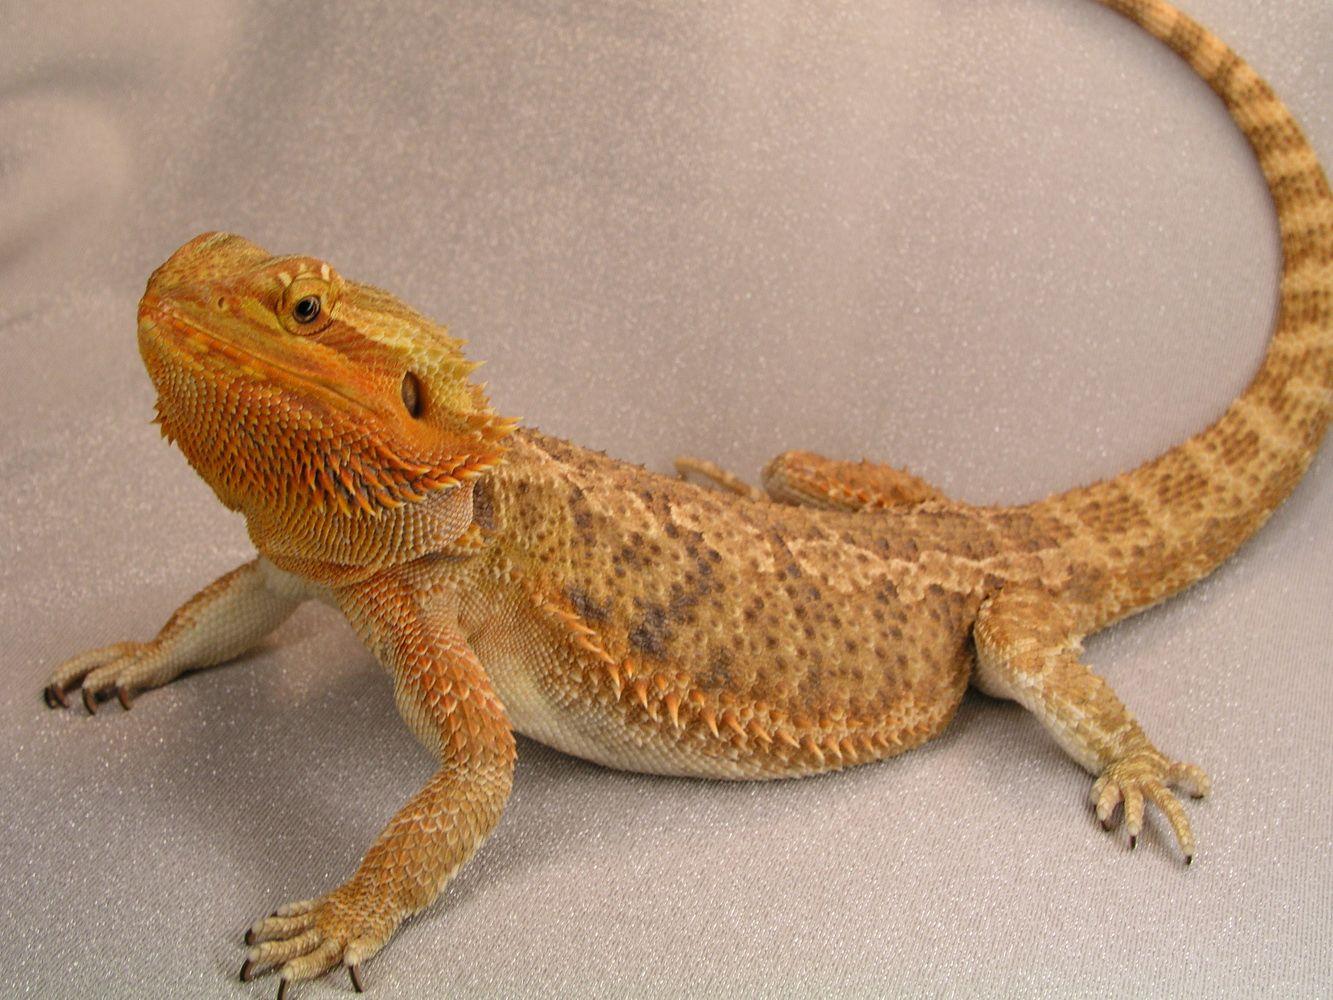 bearded dragon that looks just like mine